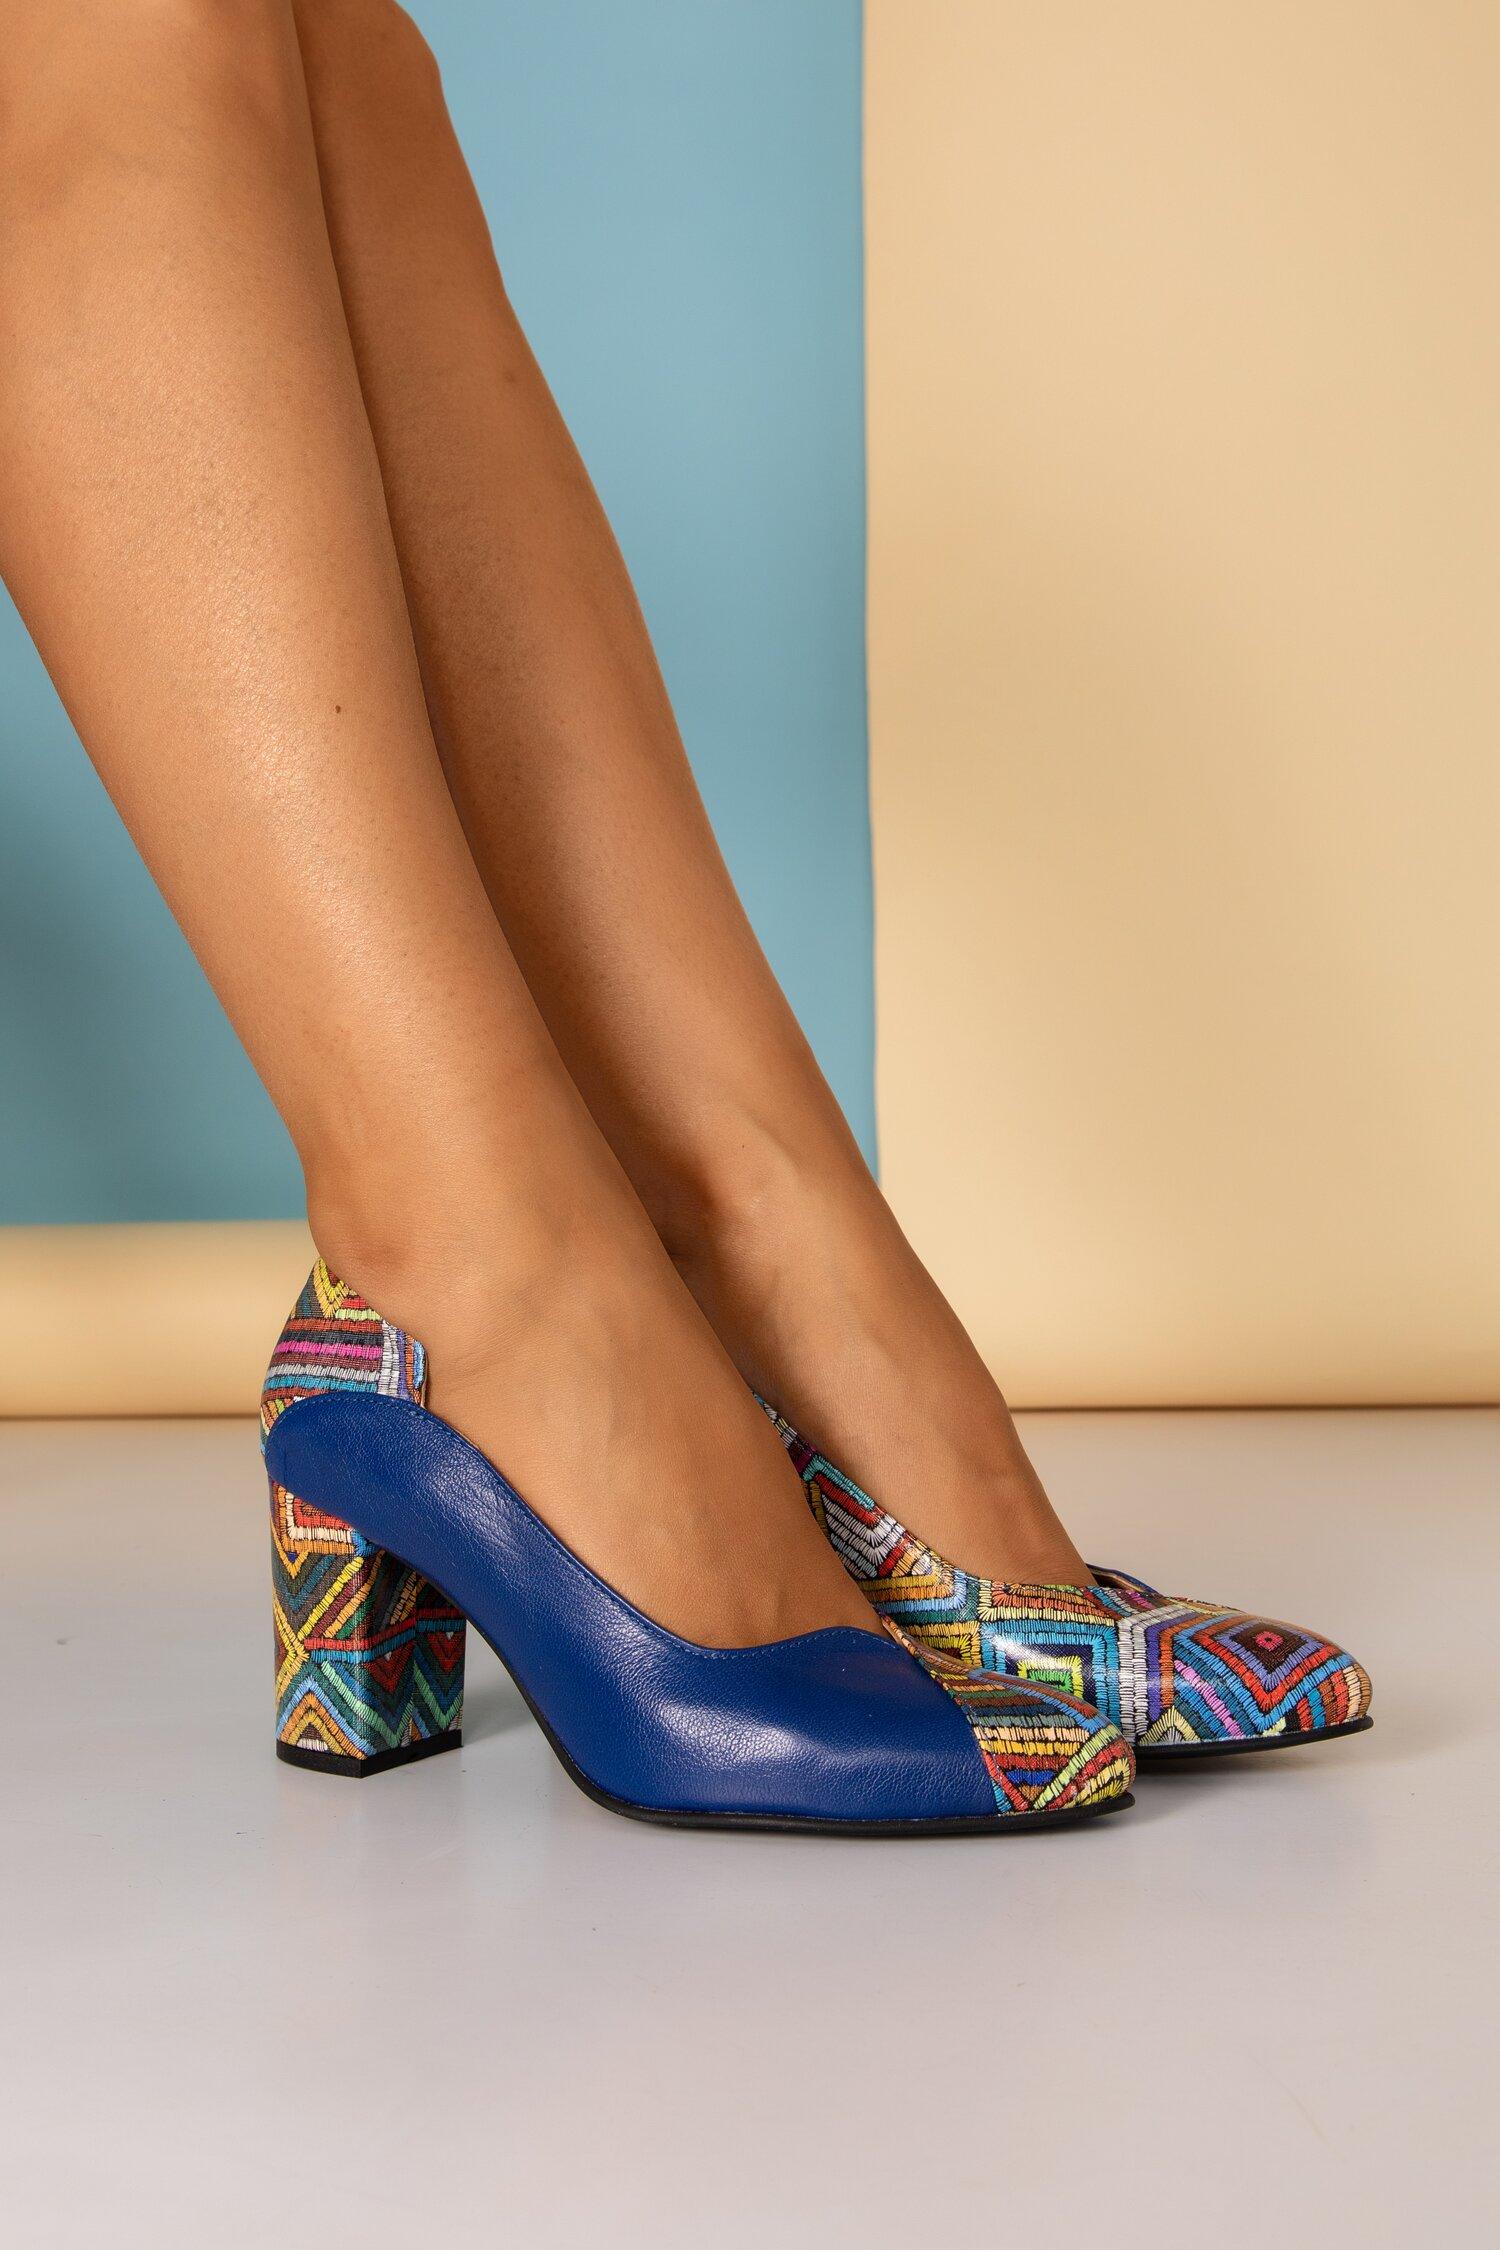 Pantofi Greenary office bleumarin cu imprimeuri in dungi